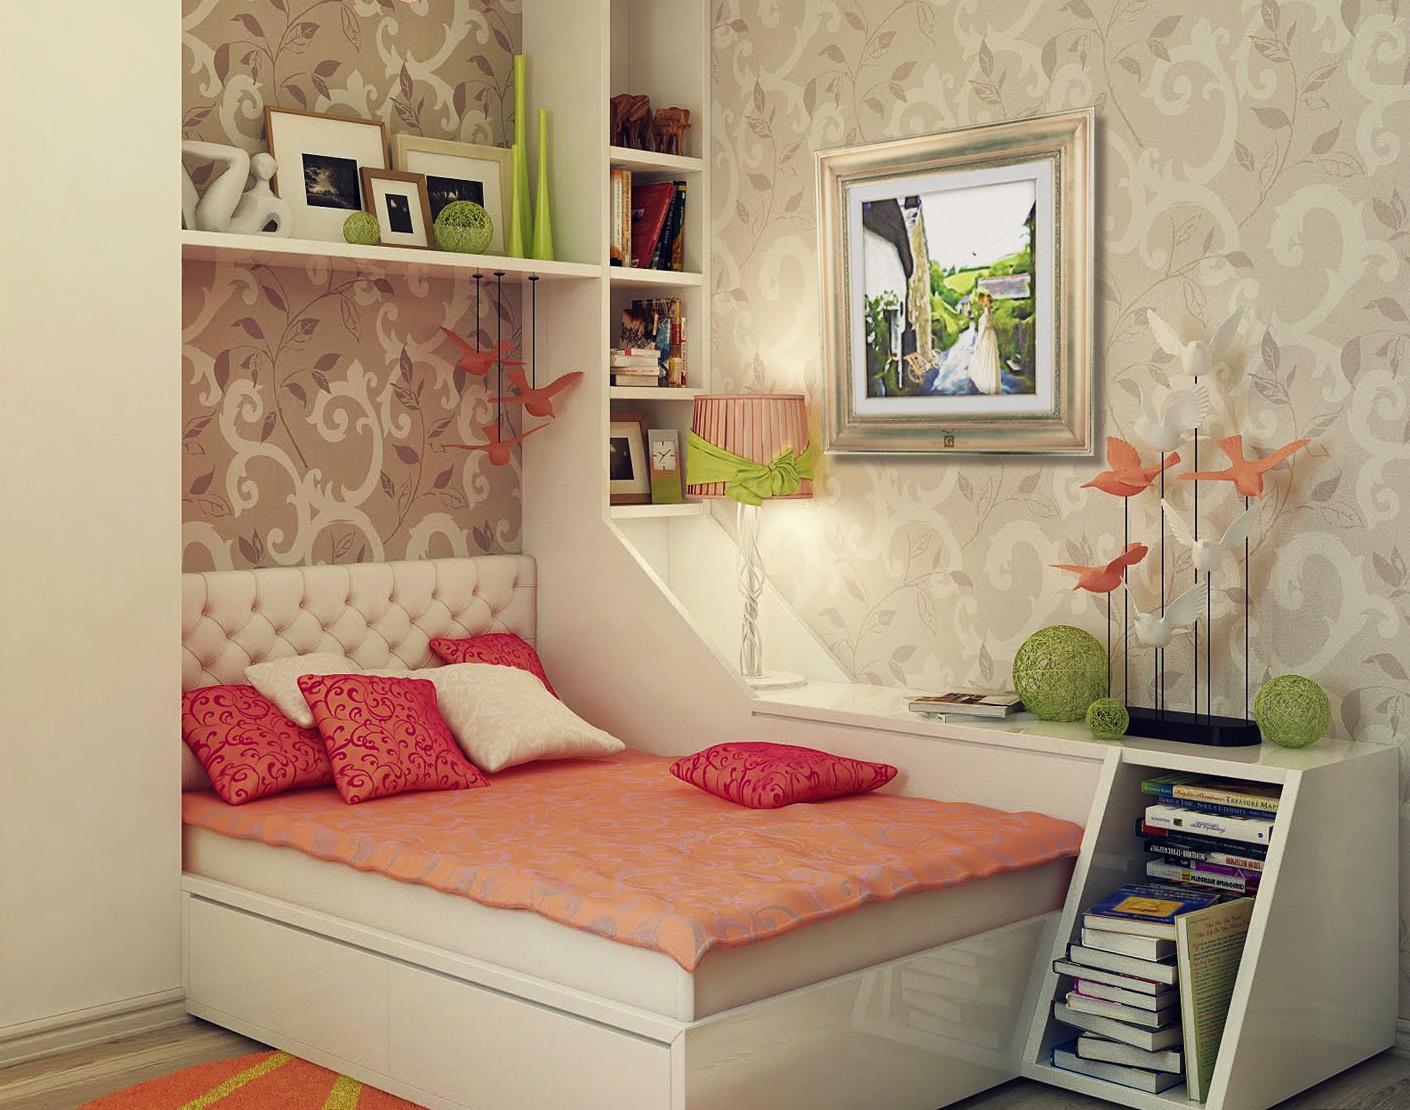 1b-Peach-green-gray-girls-bedroom-decor-pillow.jpg